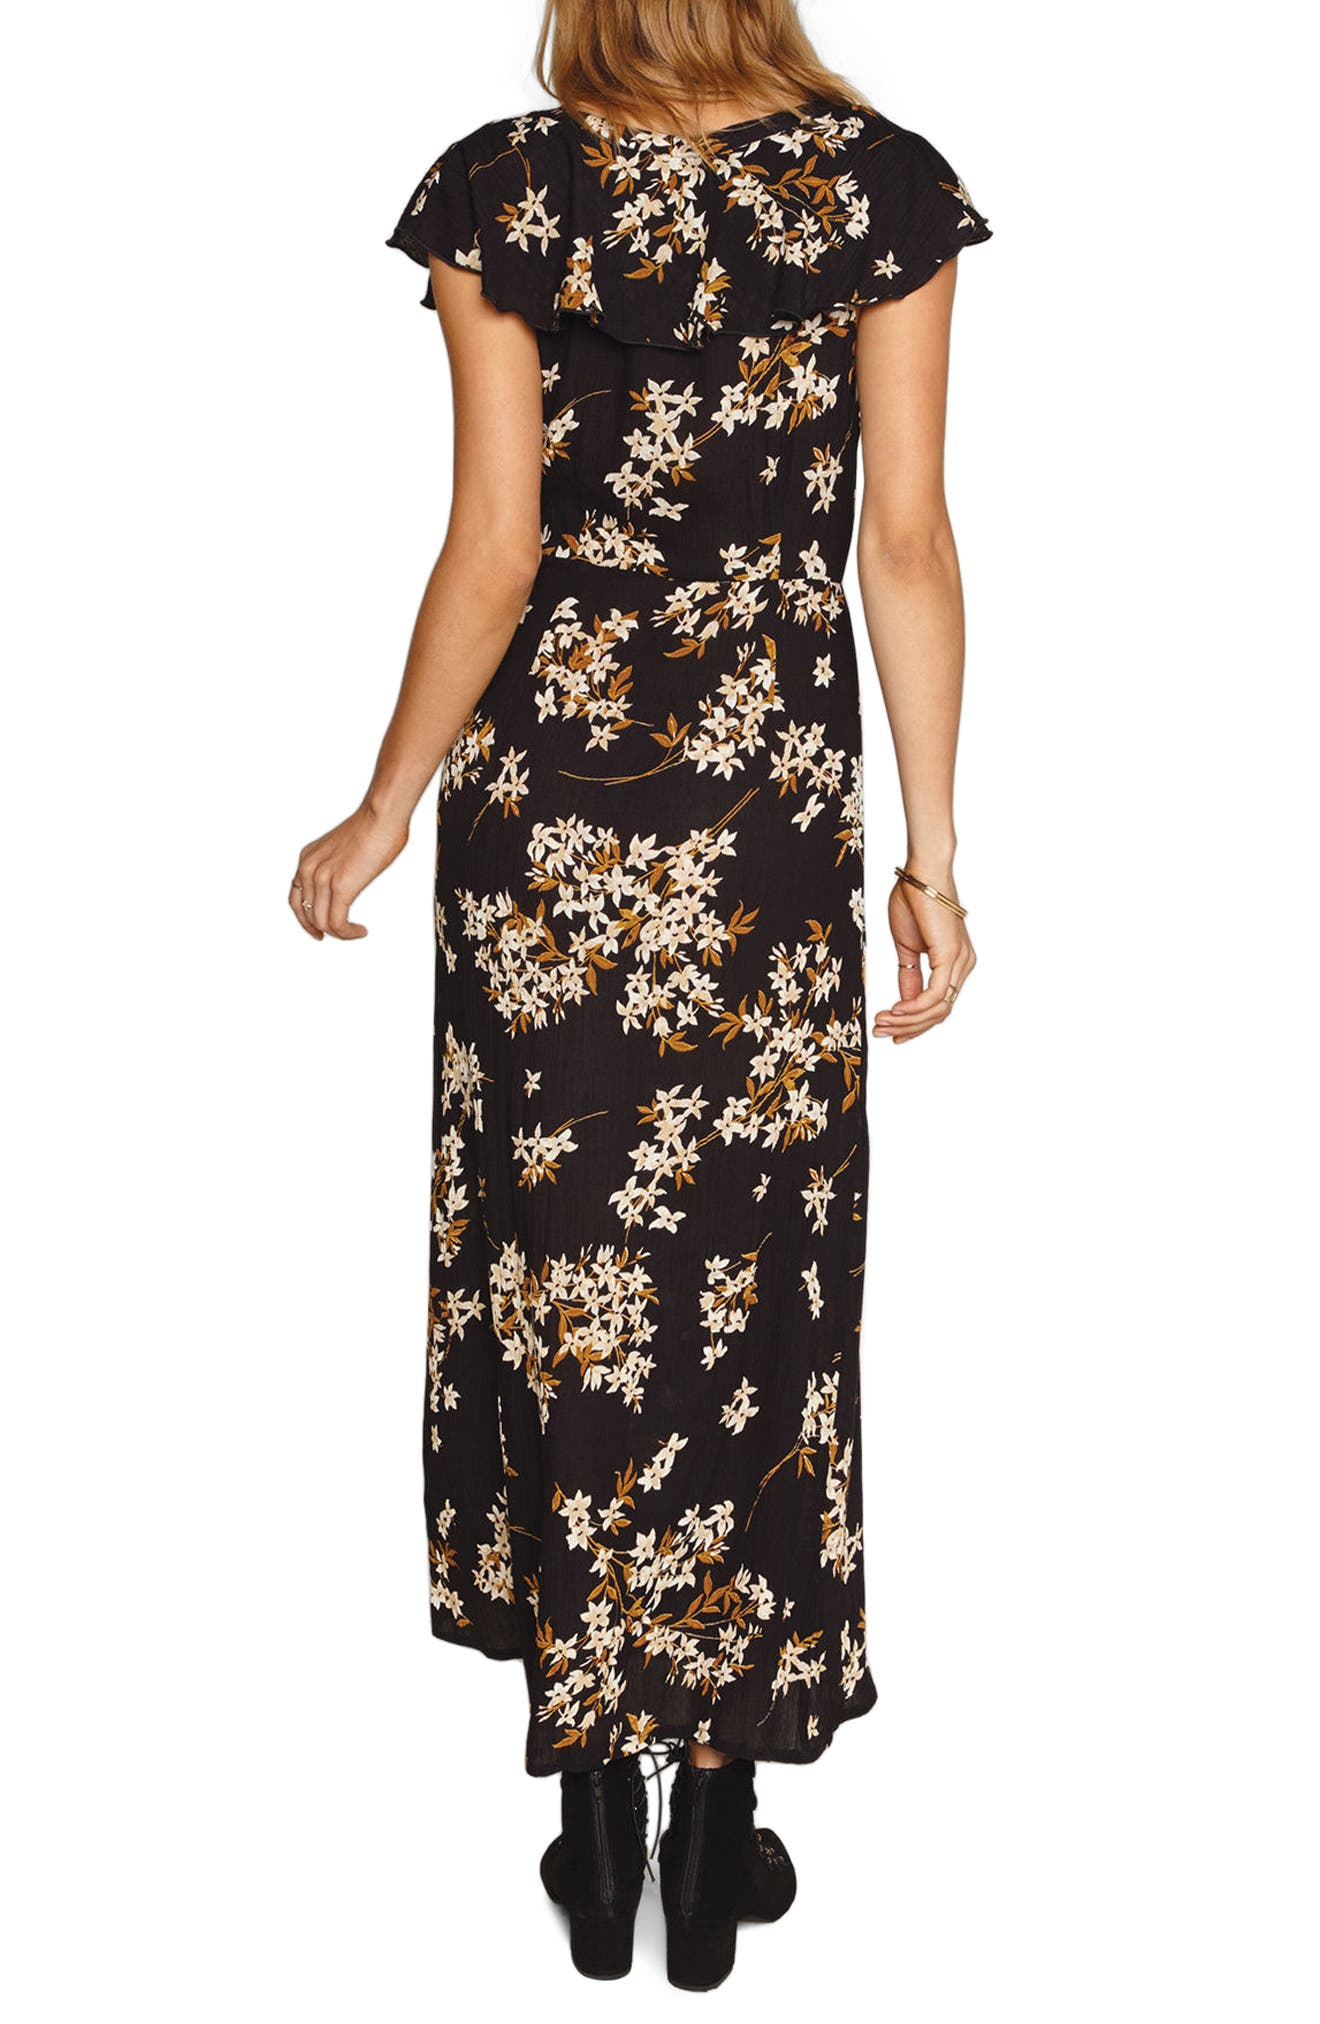 Alana Floral Lace-Up Dress,                             Alternate thumbnail 2, color,                             001